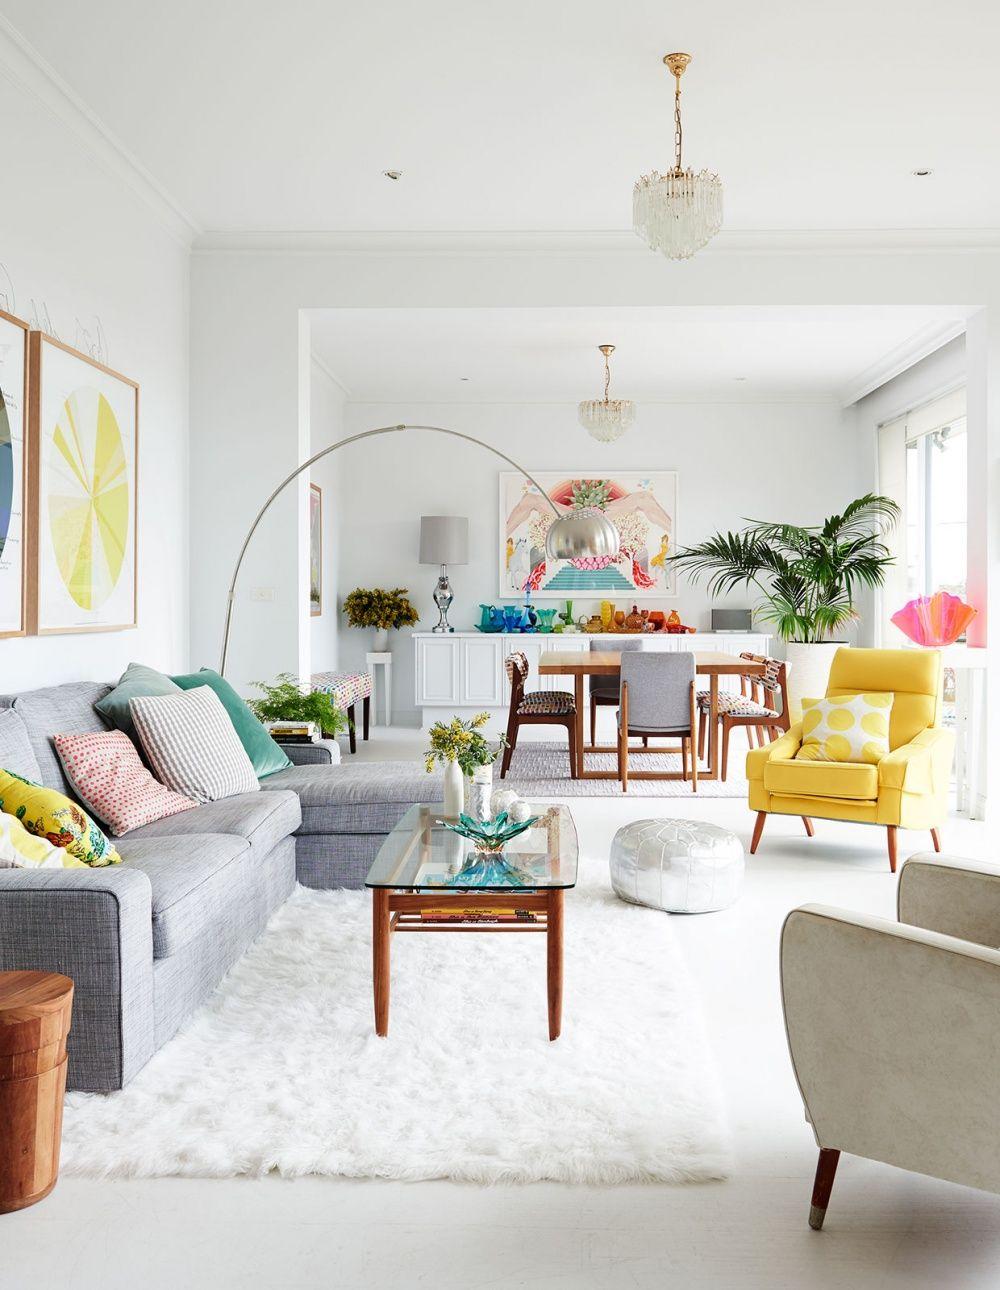 Madeleine + Jeremy Grummet + Family | Living rooms, Room and Madeleine